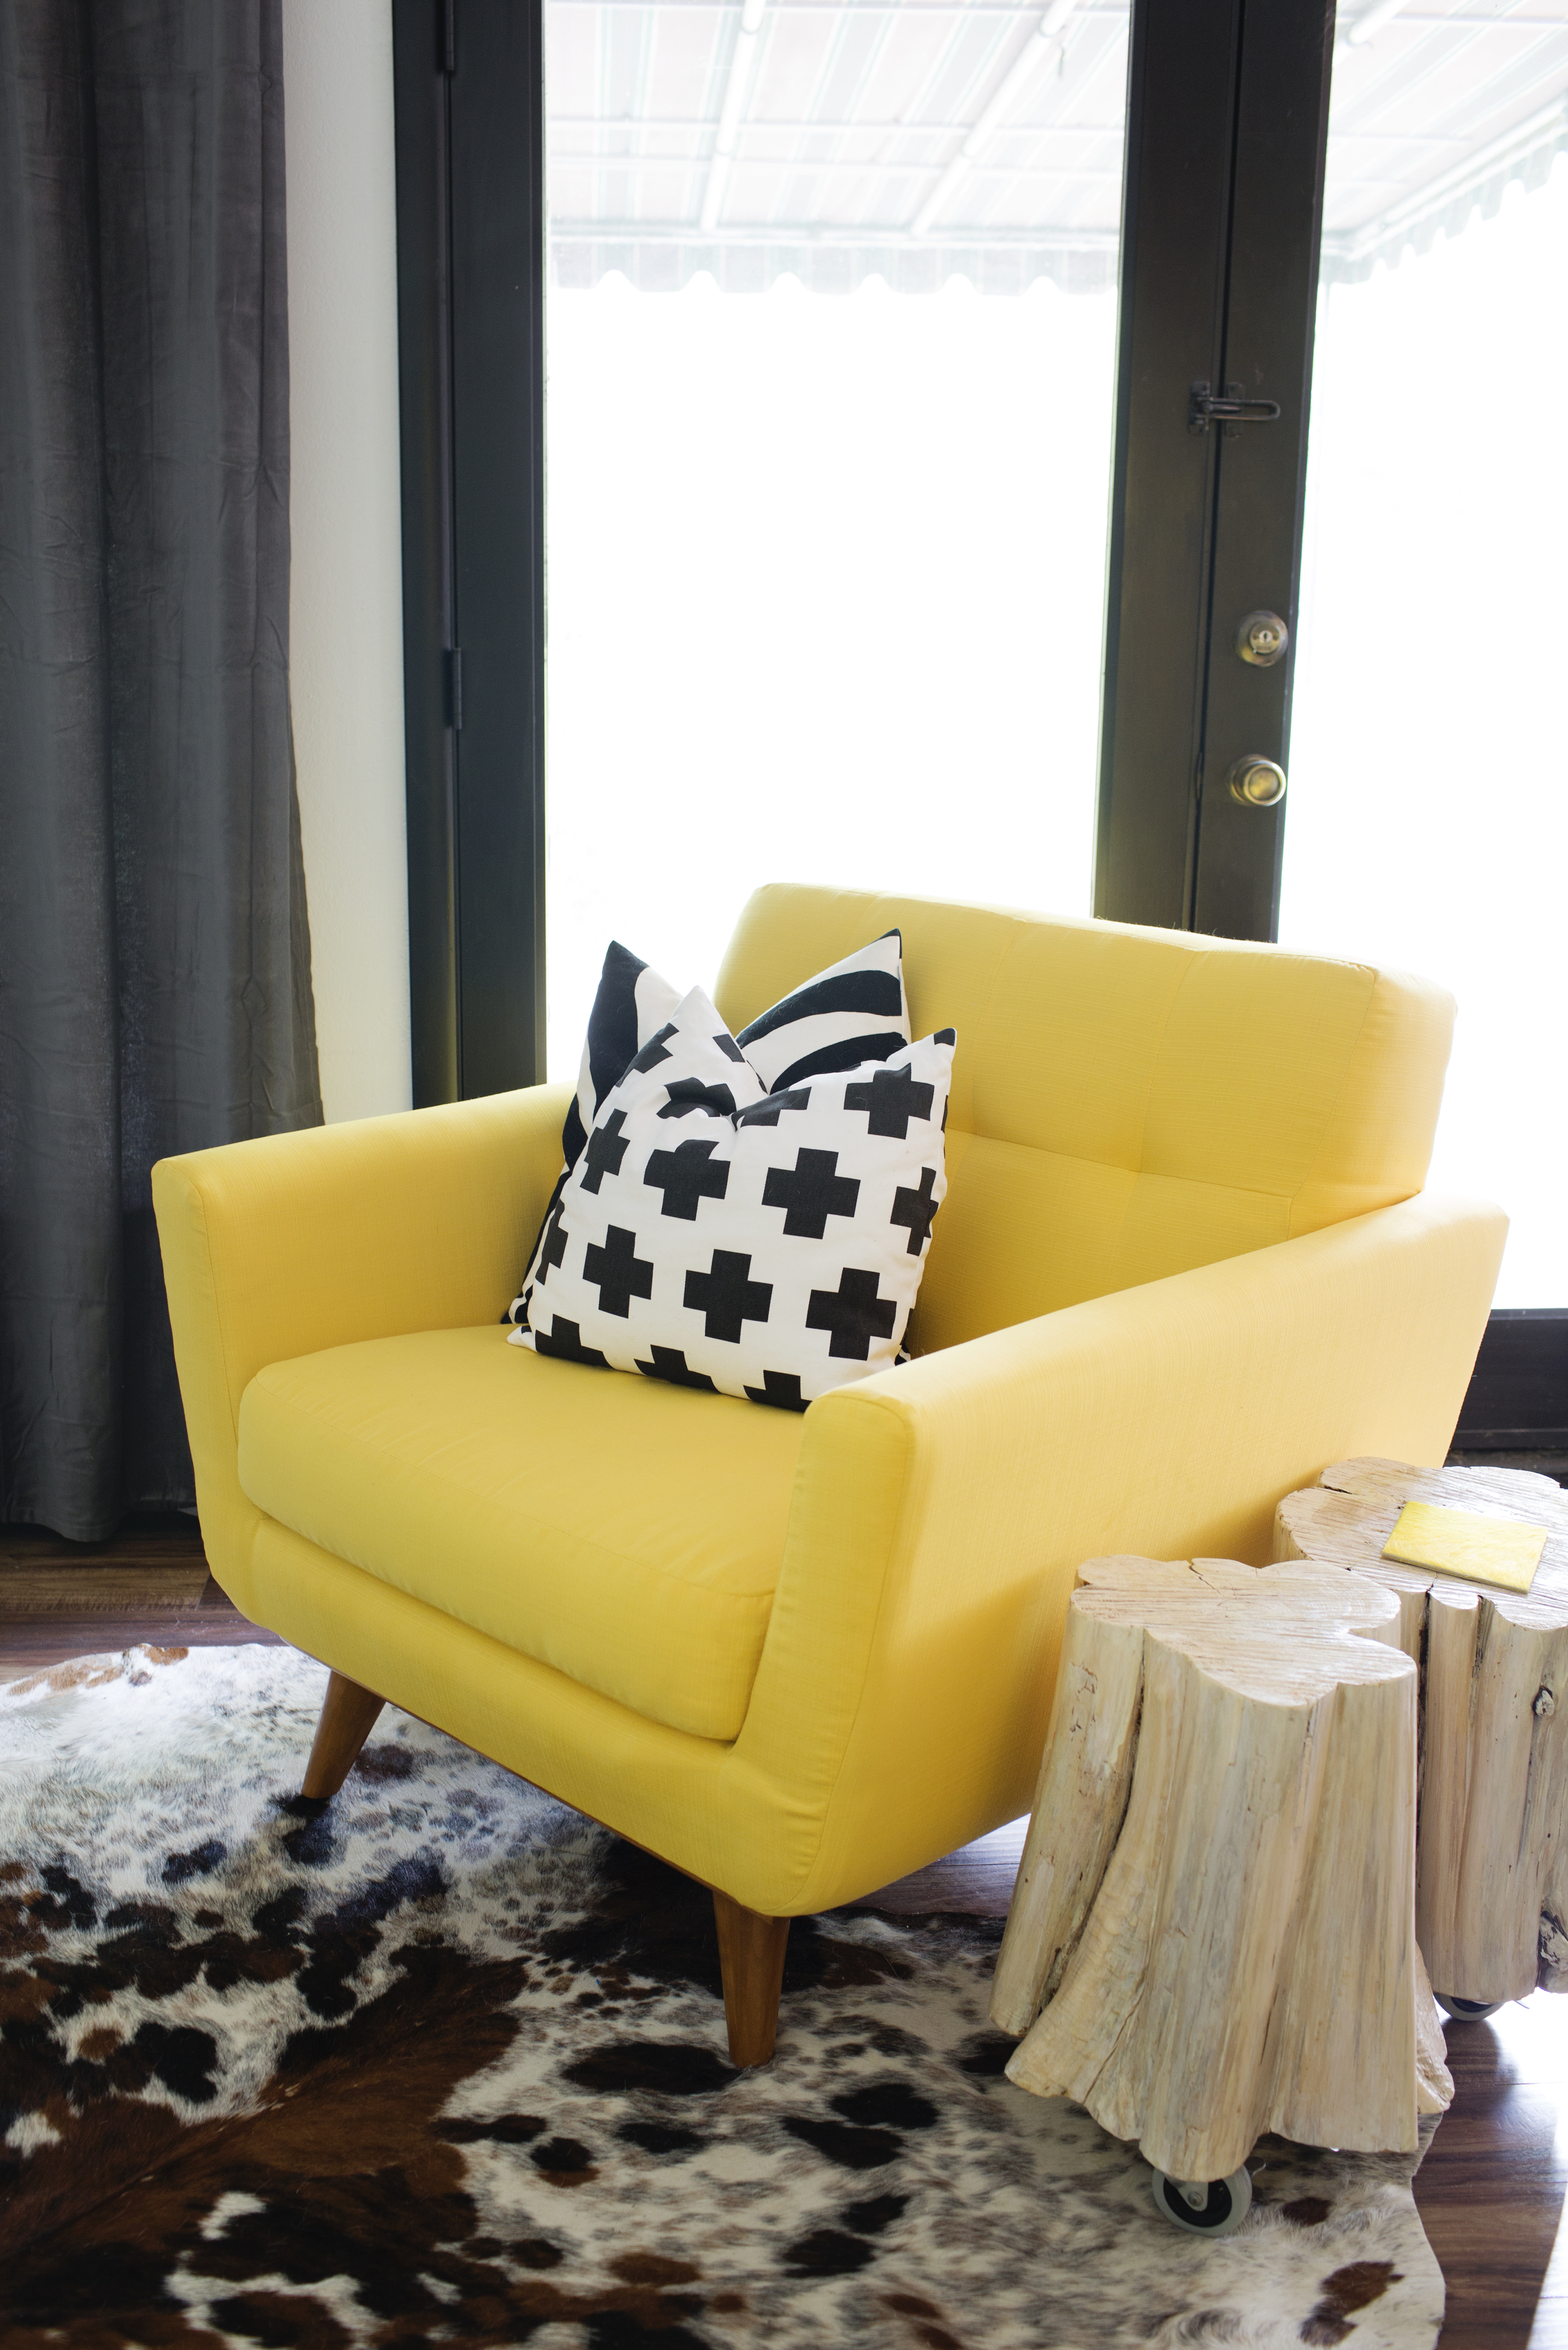 Yellow oversized chair